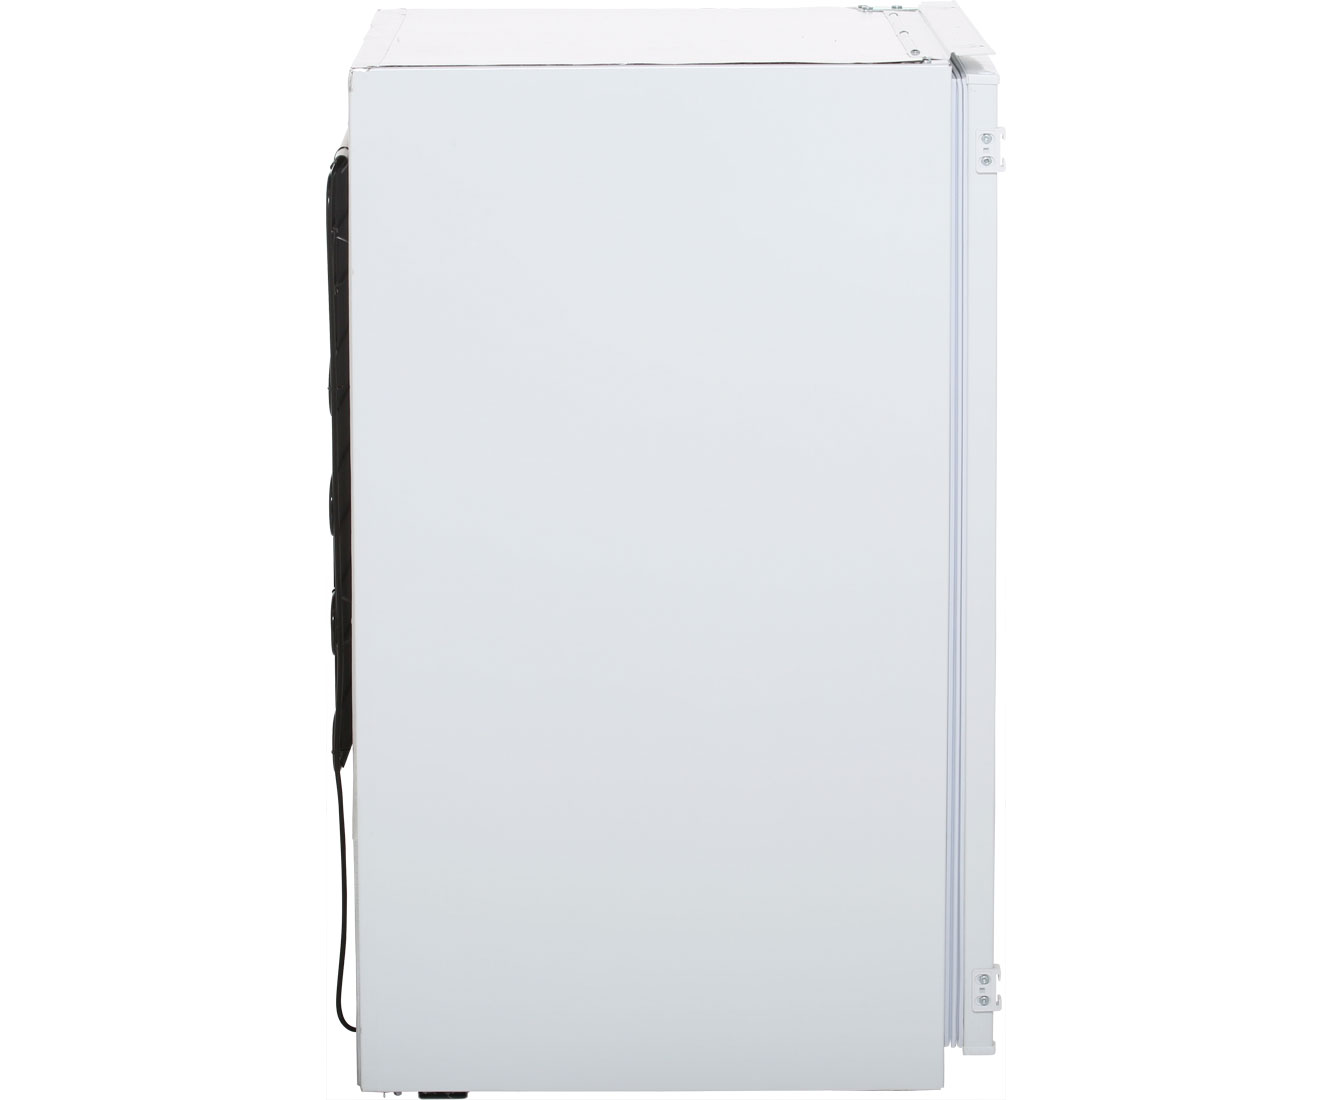 Amica Kühlschrank Idealo : Amica kühlschrank preisvergleich amica ks w ab u ac